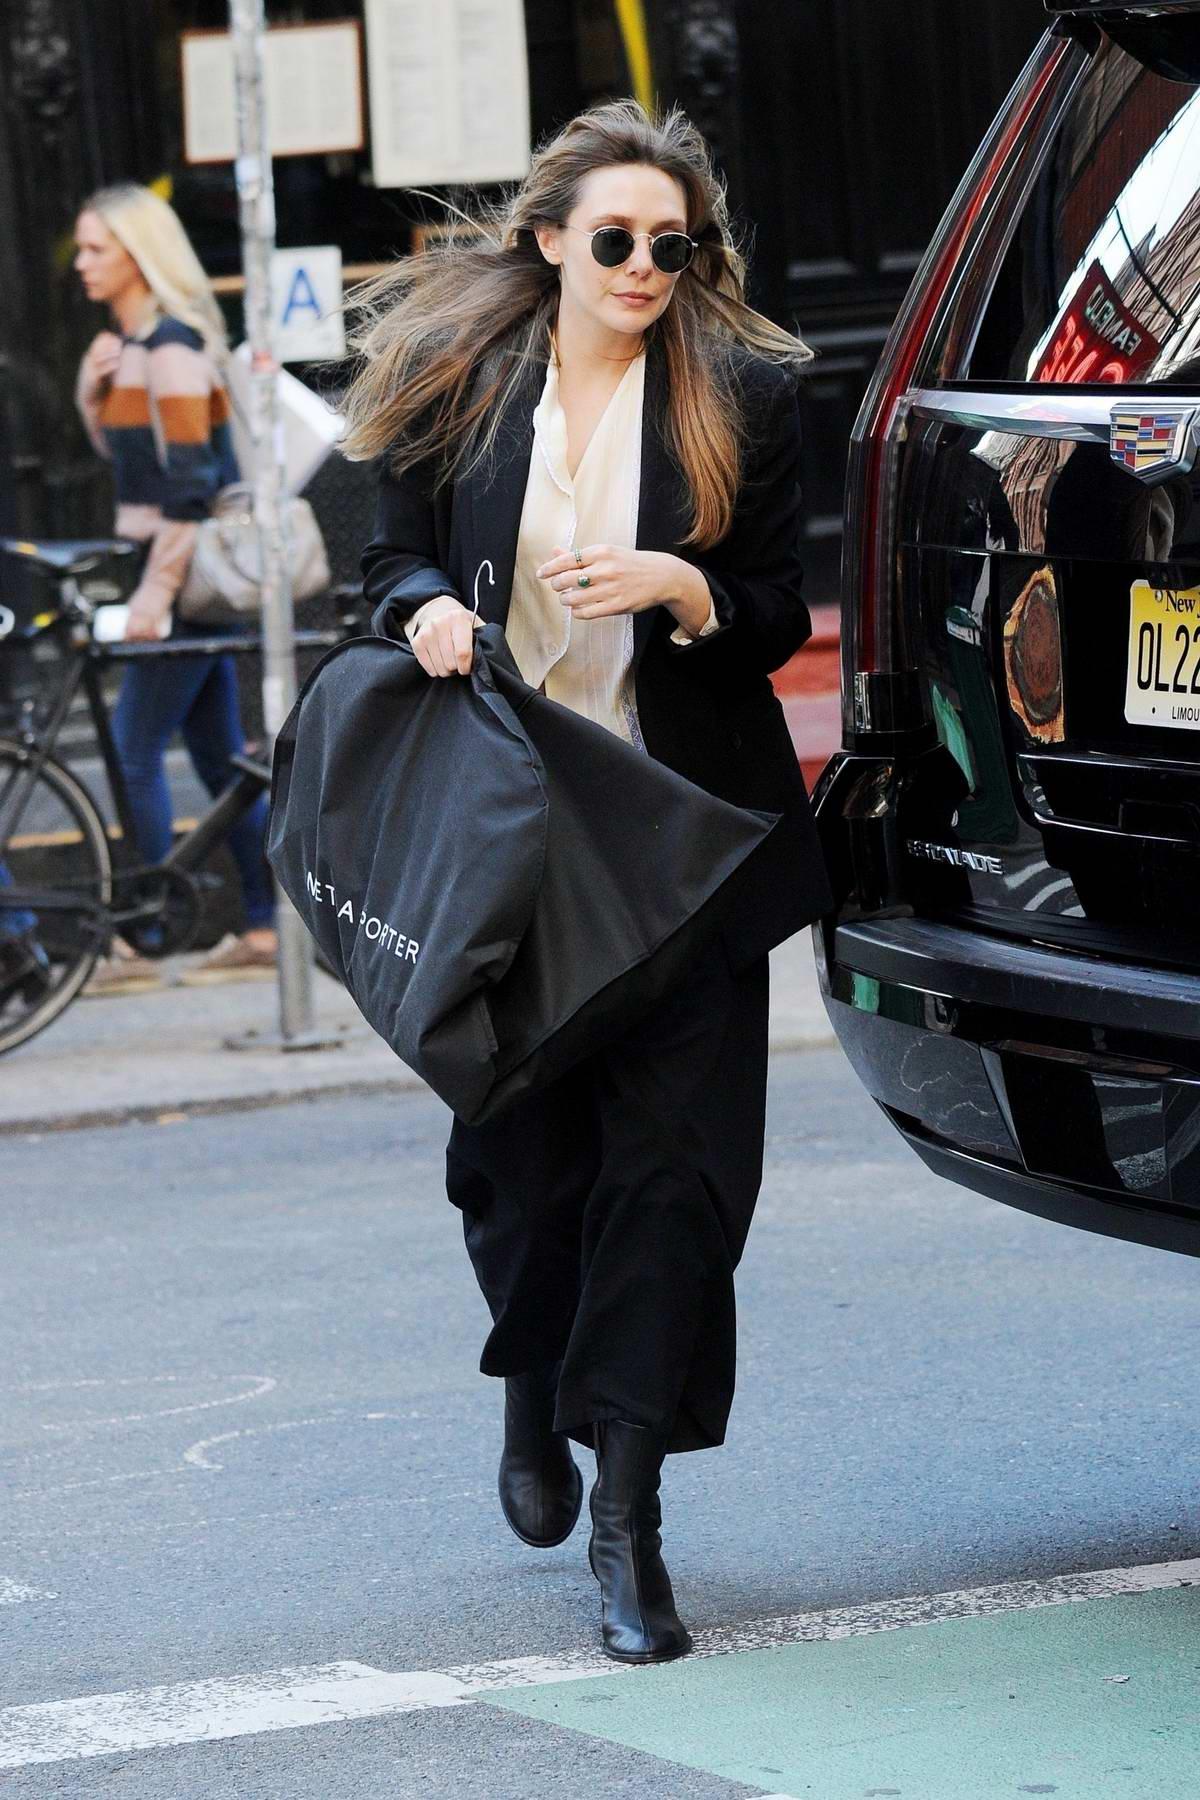 Elizabeth Olsen steps out with a garment bag in New York City